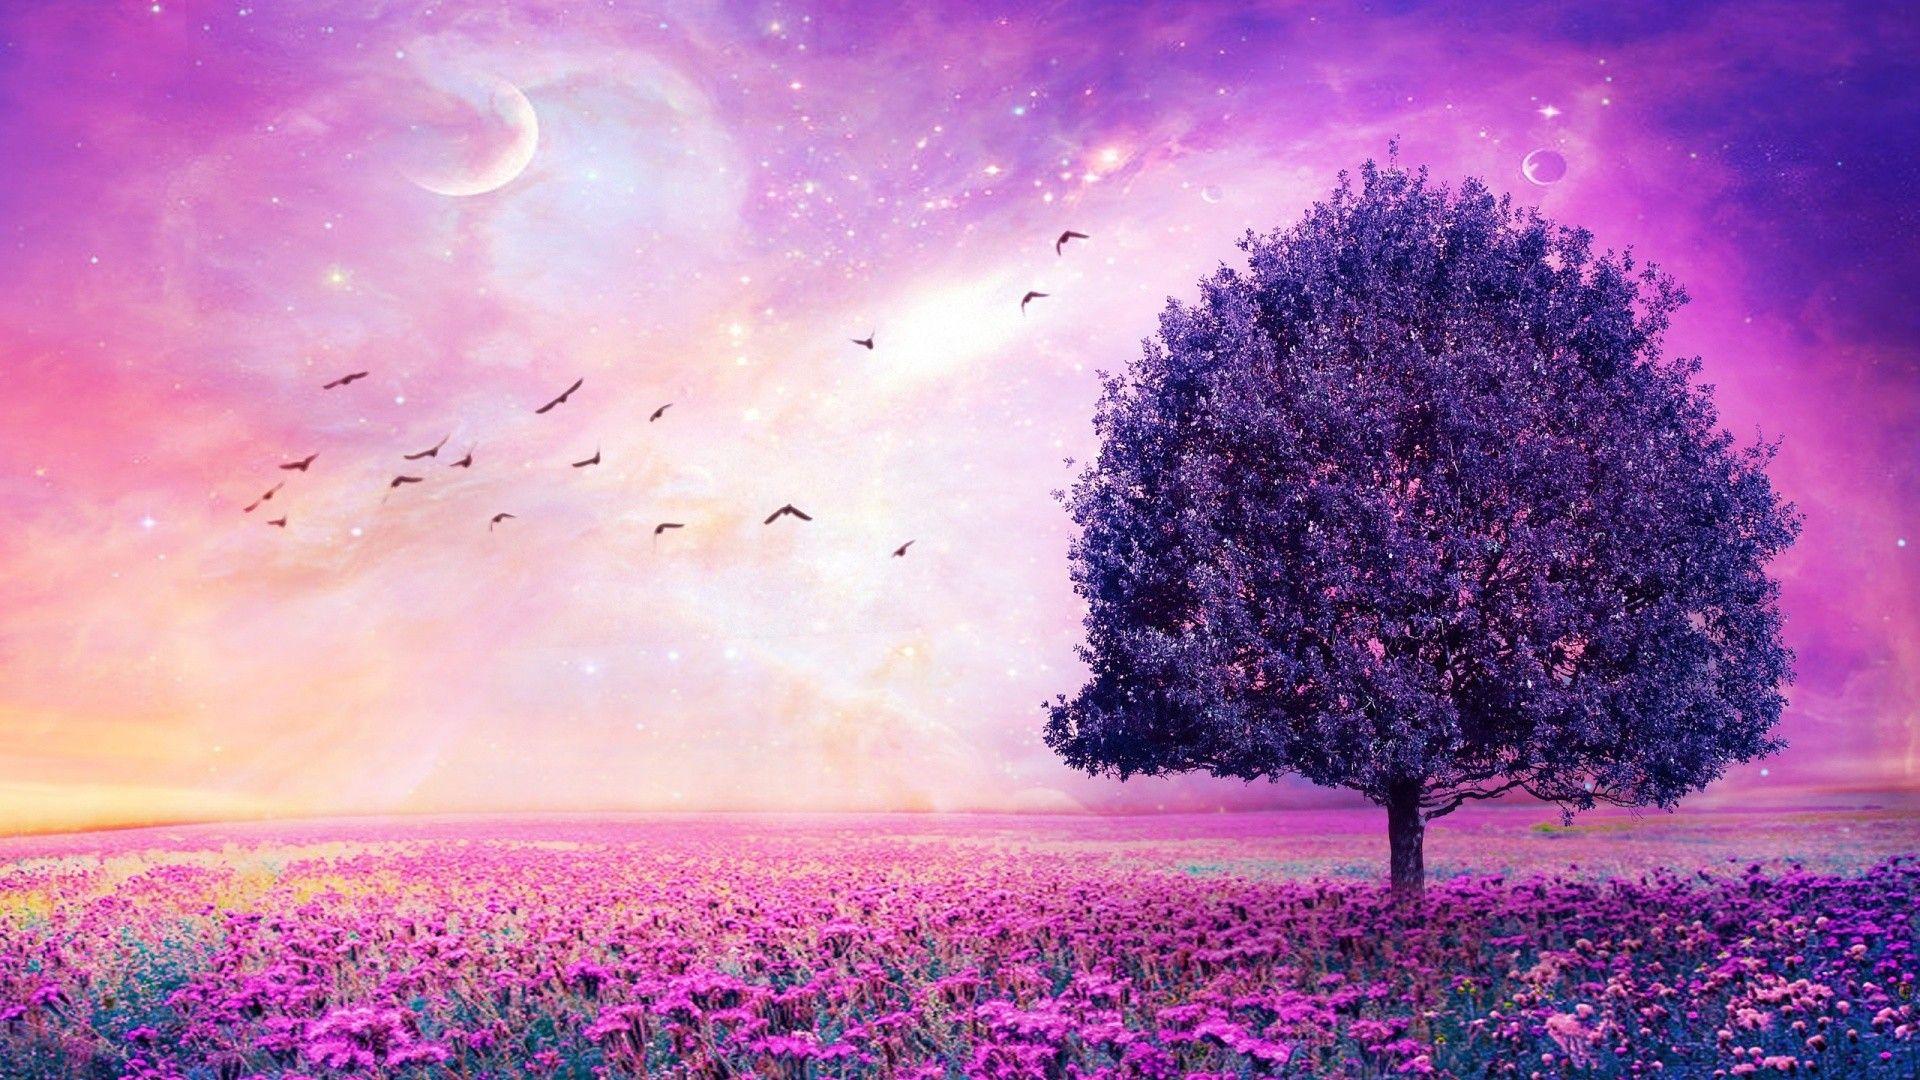 1920x1080 Purple Flower Wallpaper Free Download For Desktop Desktop Wallpapers High Definition Purple Flowers Wallpaper Abstract Art Wallpaper Field Wallpaper